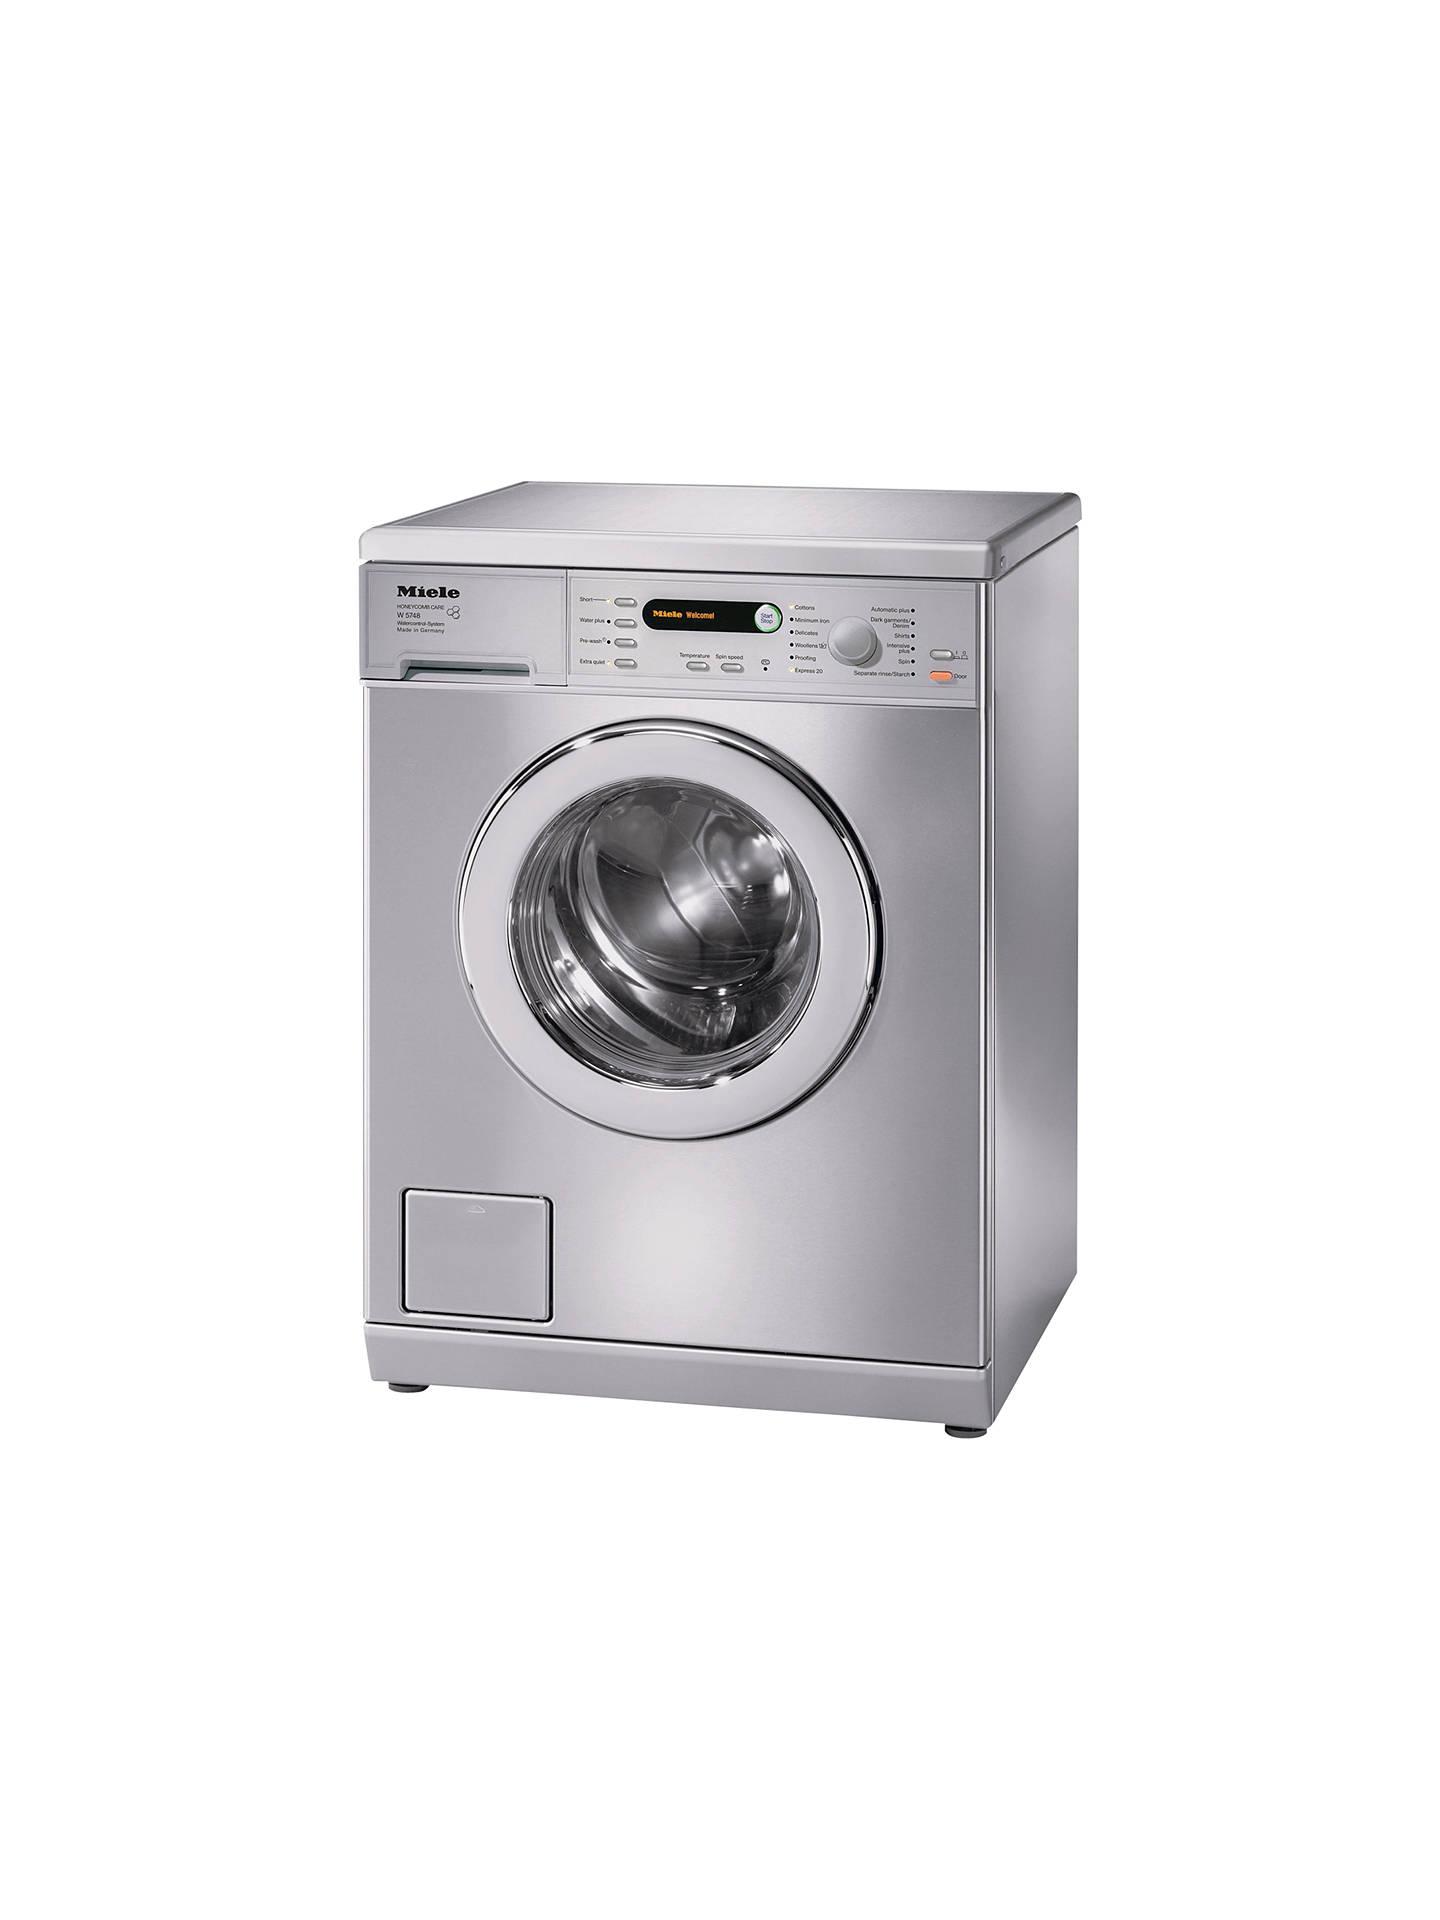 Miele W5748 Freestanding Washing Machine, 7kg Load, A ...